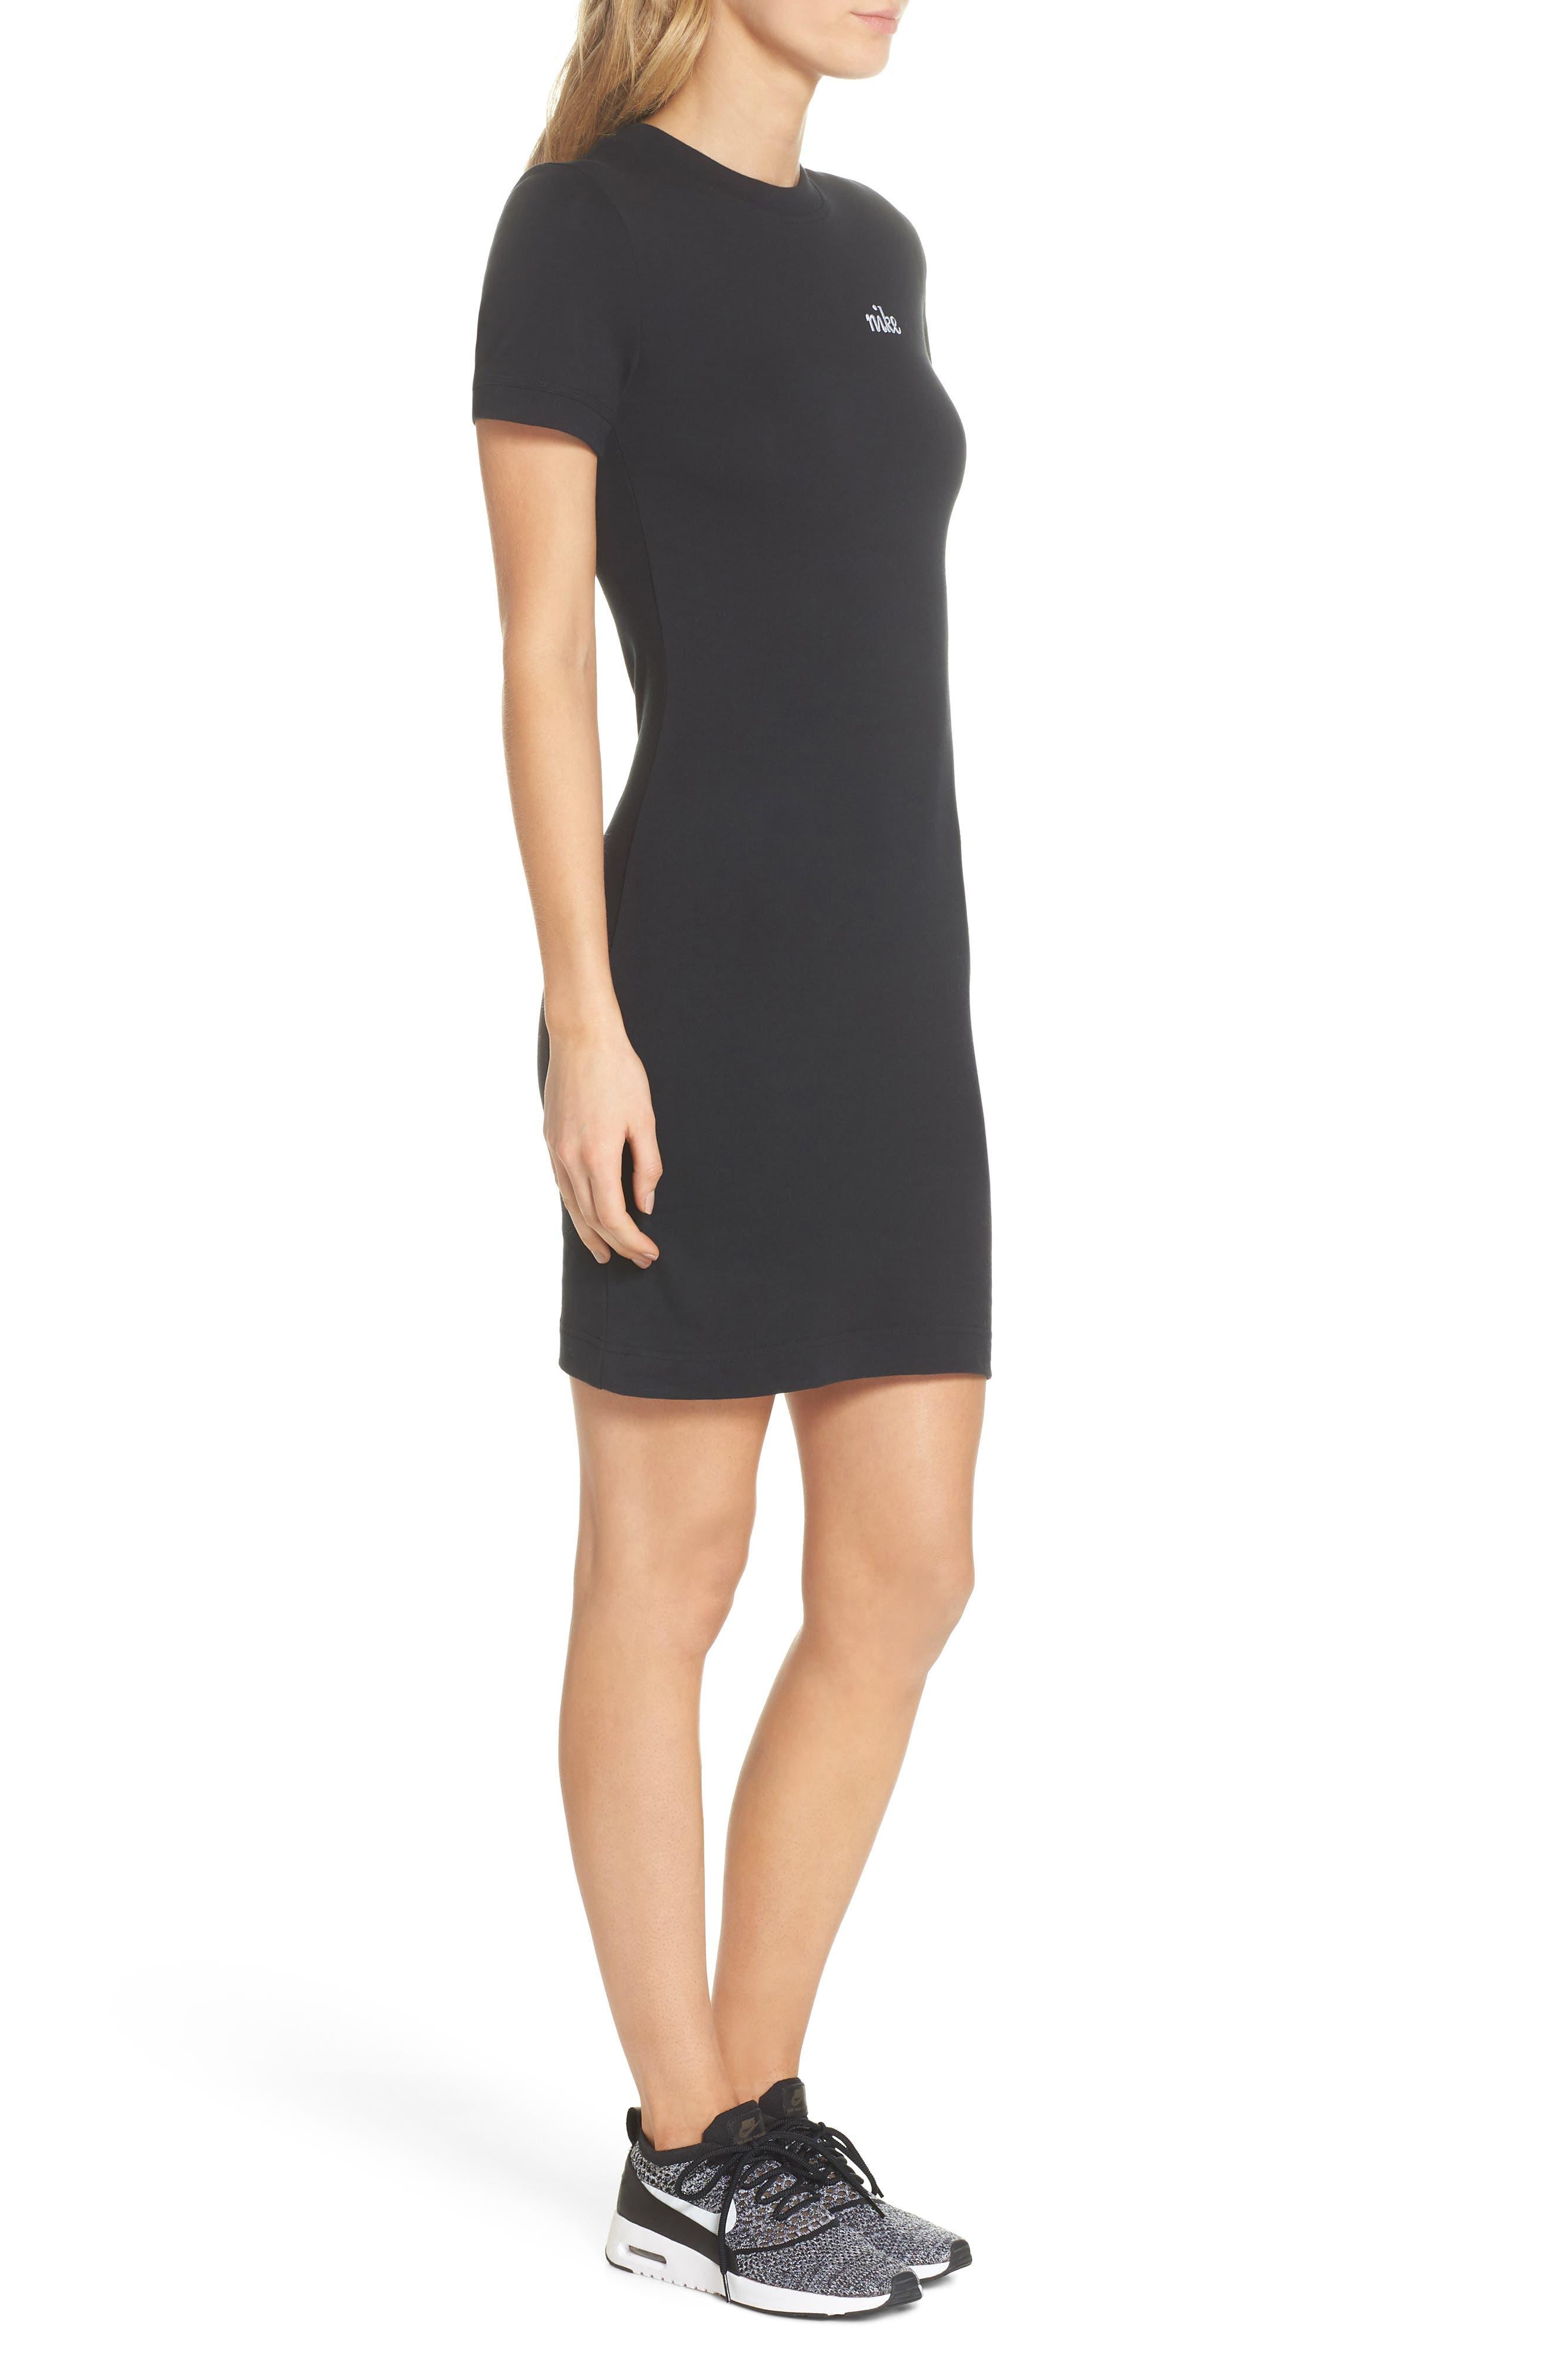 Sportswear T-Shirt Dress,                             Alternate thumbnail 3, color,                             Black/ White